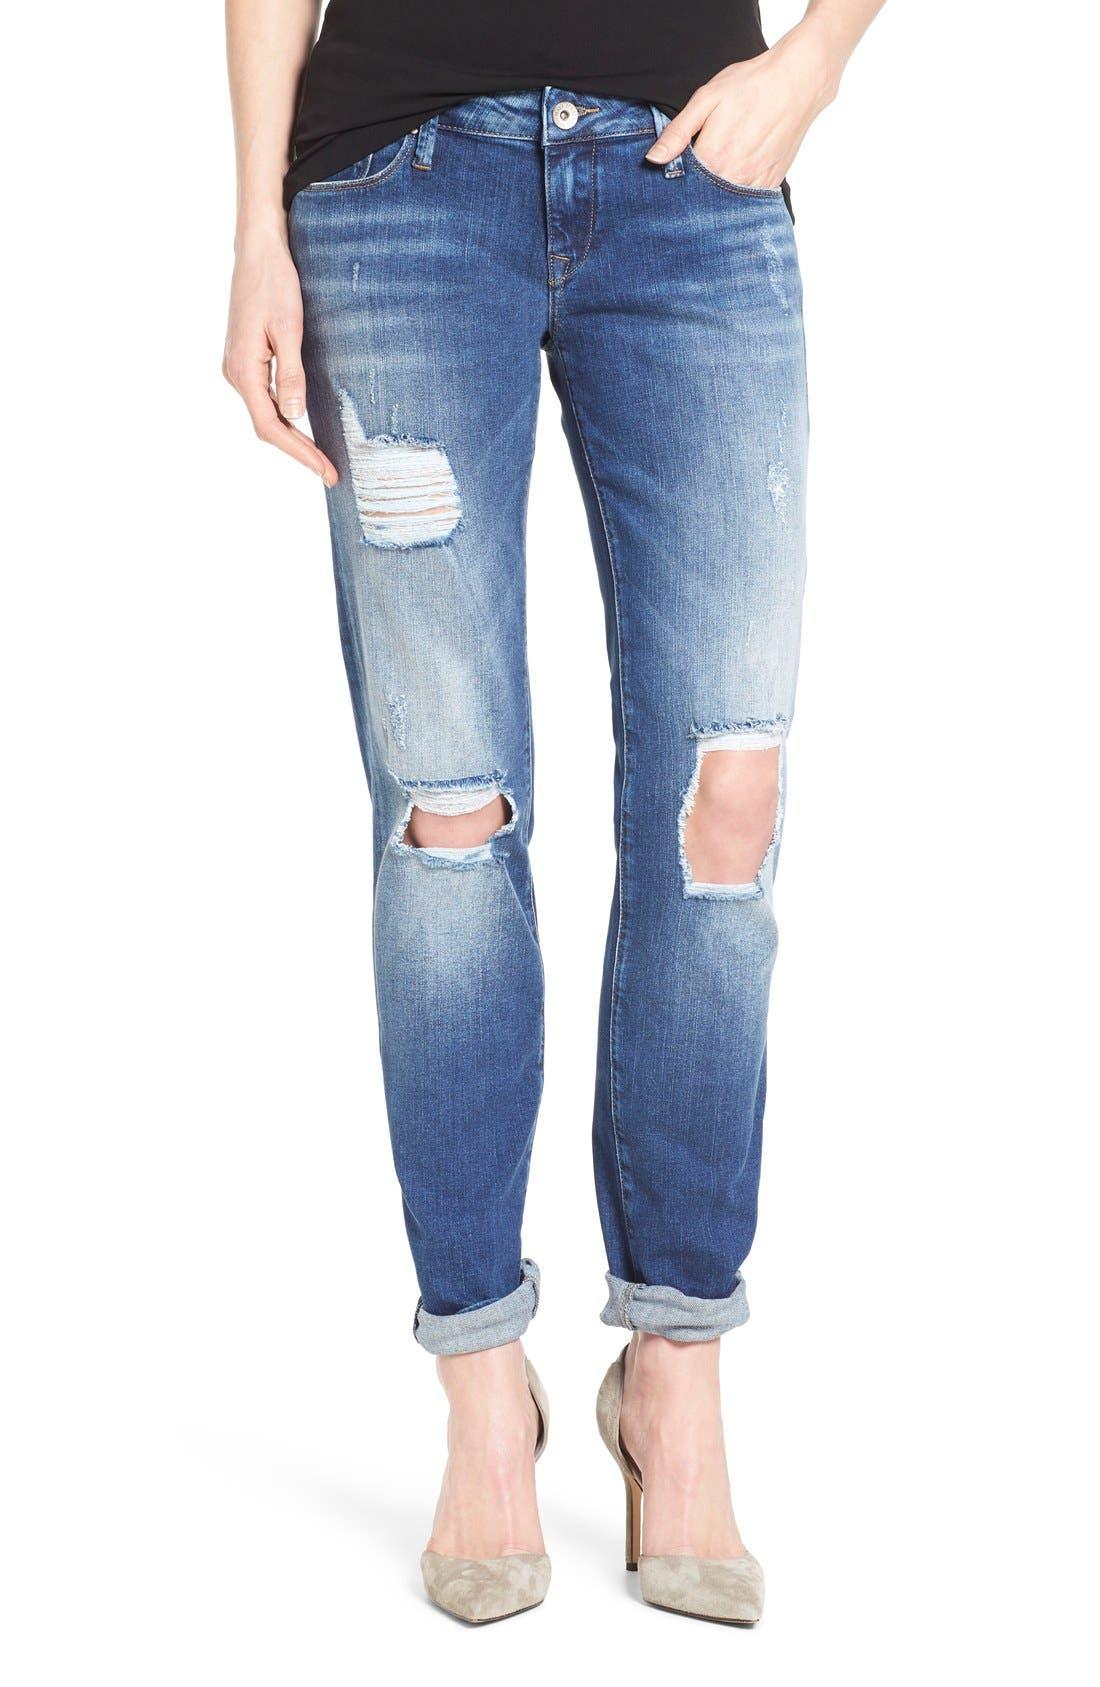 Alternate Image 1 Selected - Mavi Jeans 'Emma' Ripped Knee Boyfriend Slim Jeans (Vintage)